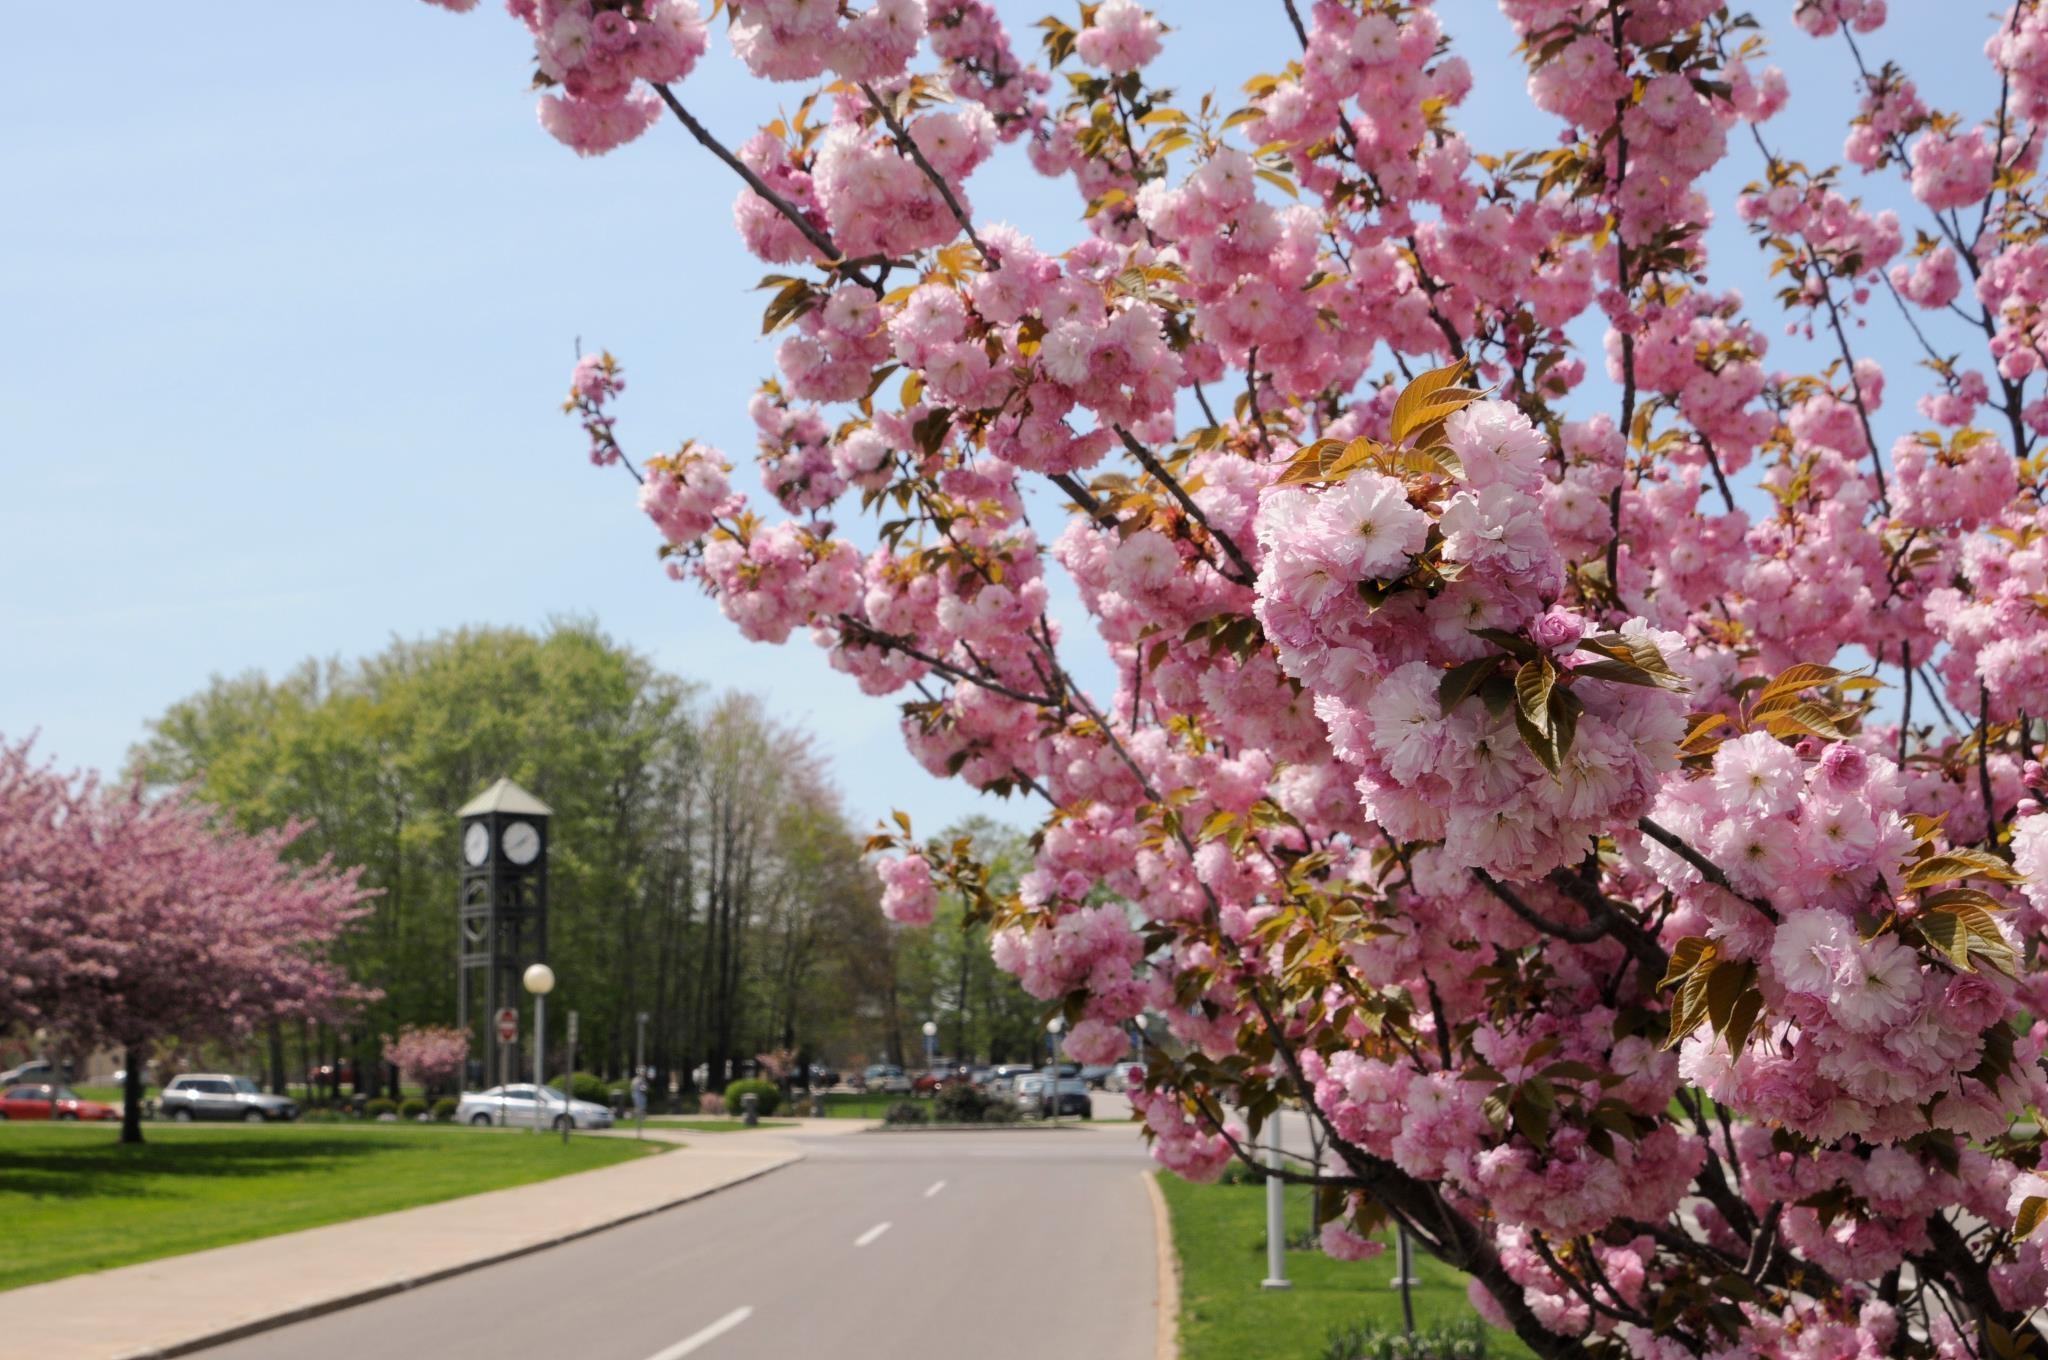 State University Of New York At Fredonia Mail: State University Of New York At Fredonia (SUNY Fredonia